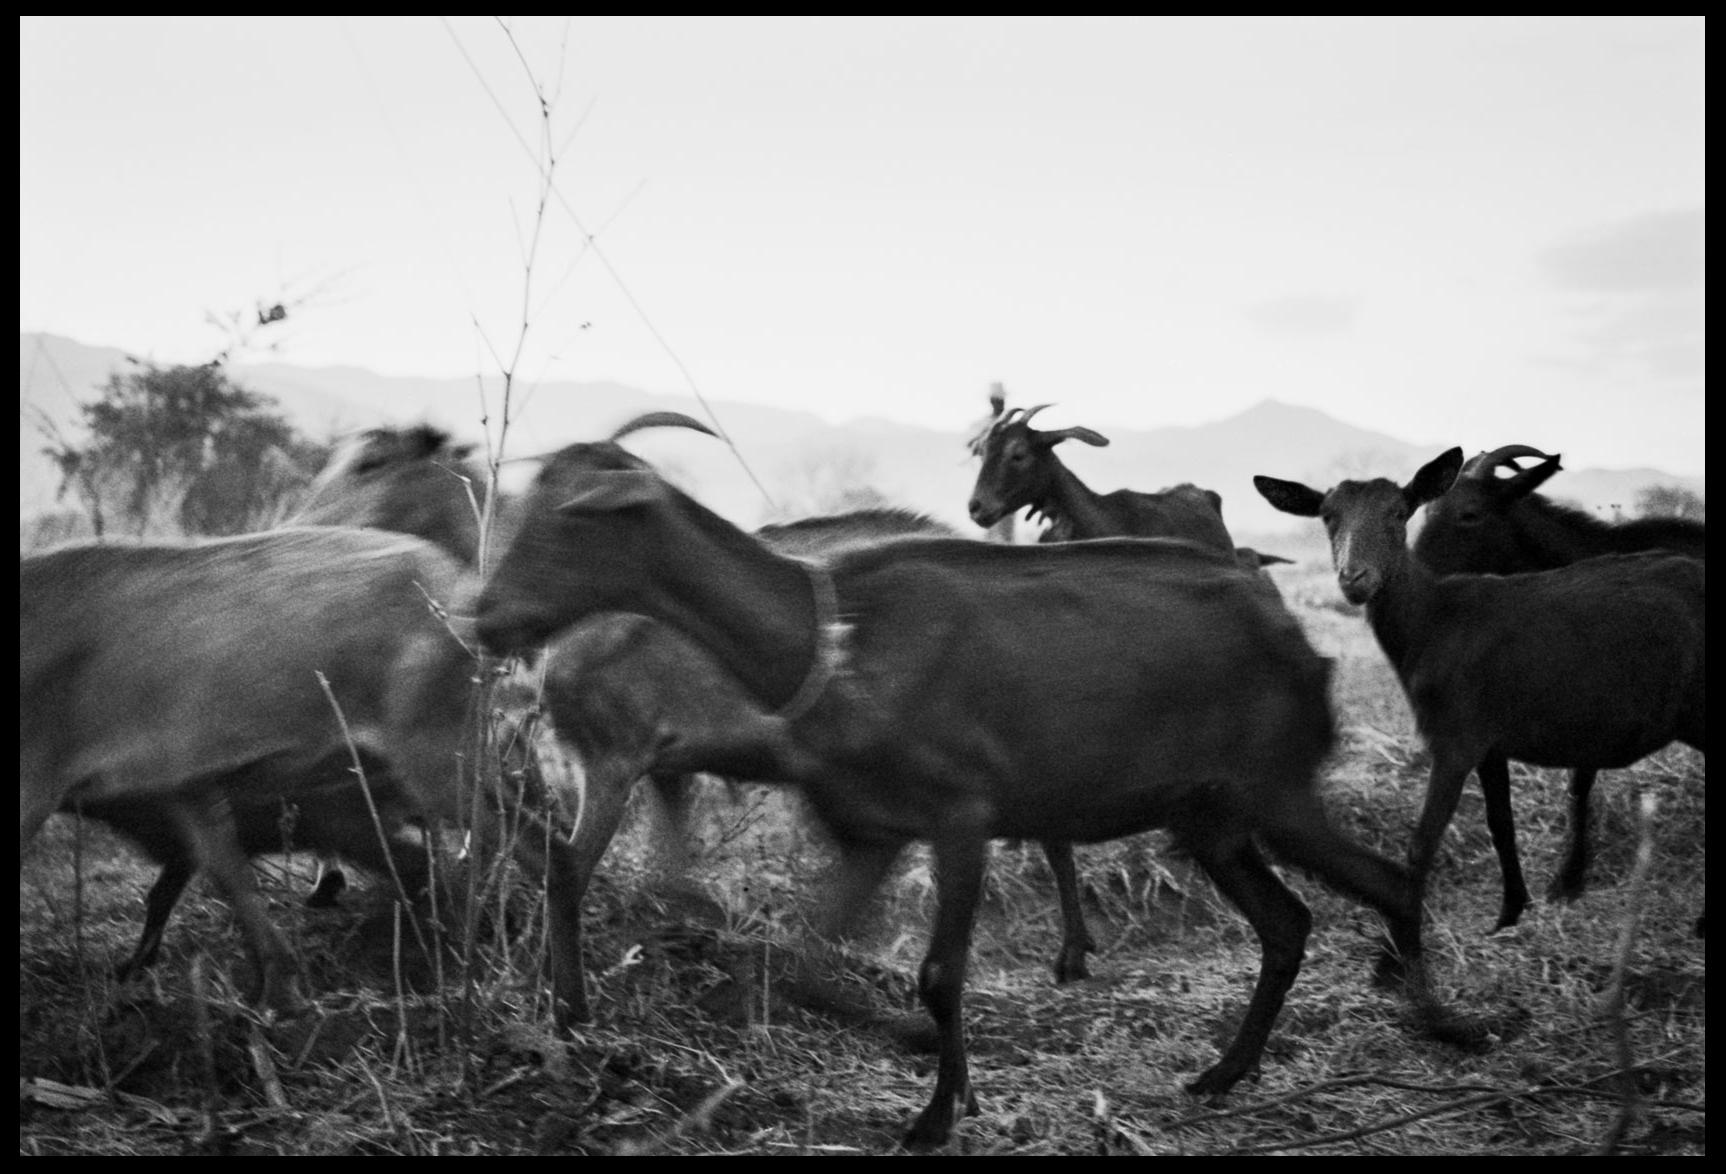 Goat herder Oaxaca, Mexico, 2005